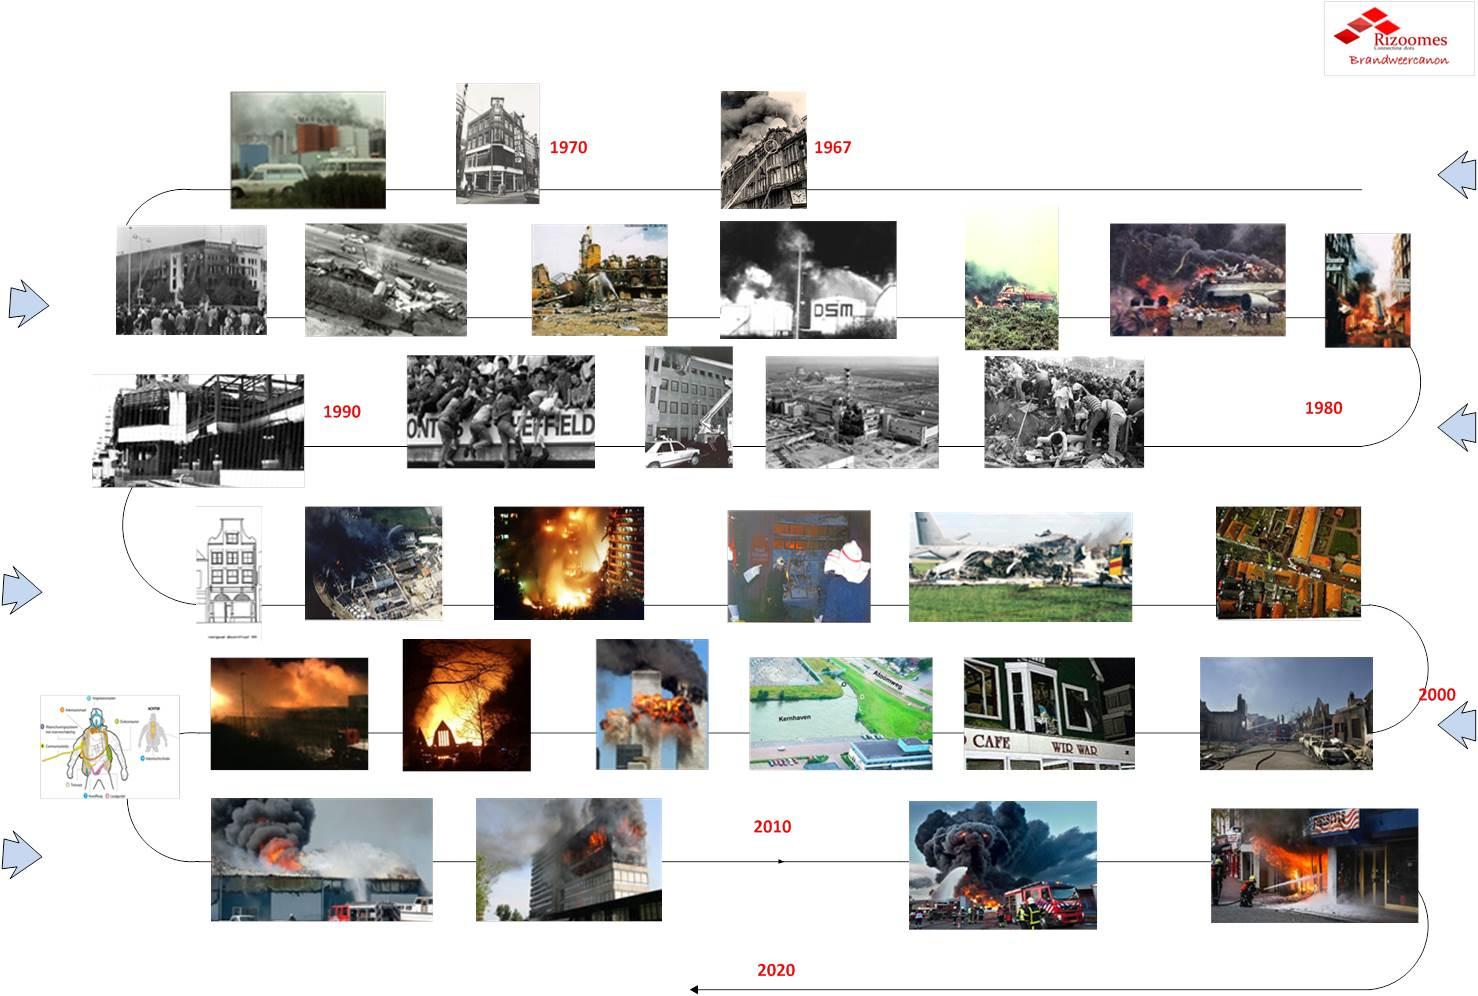 brandweercanon3